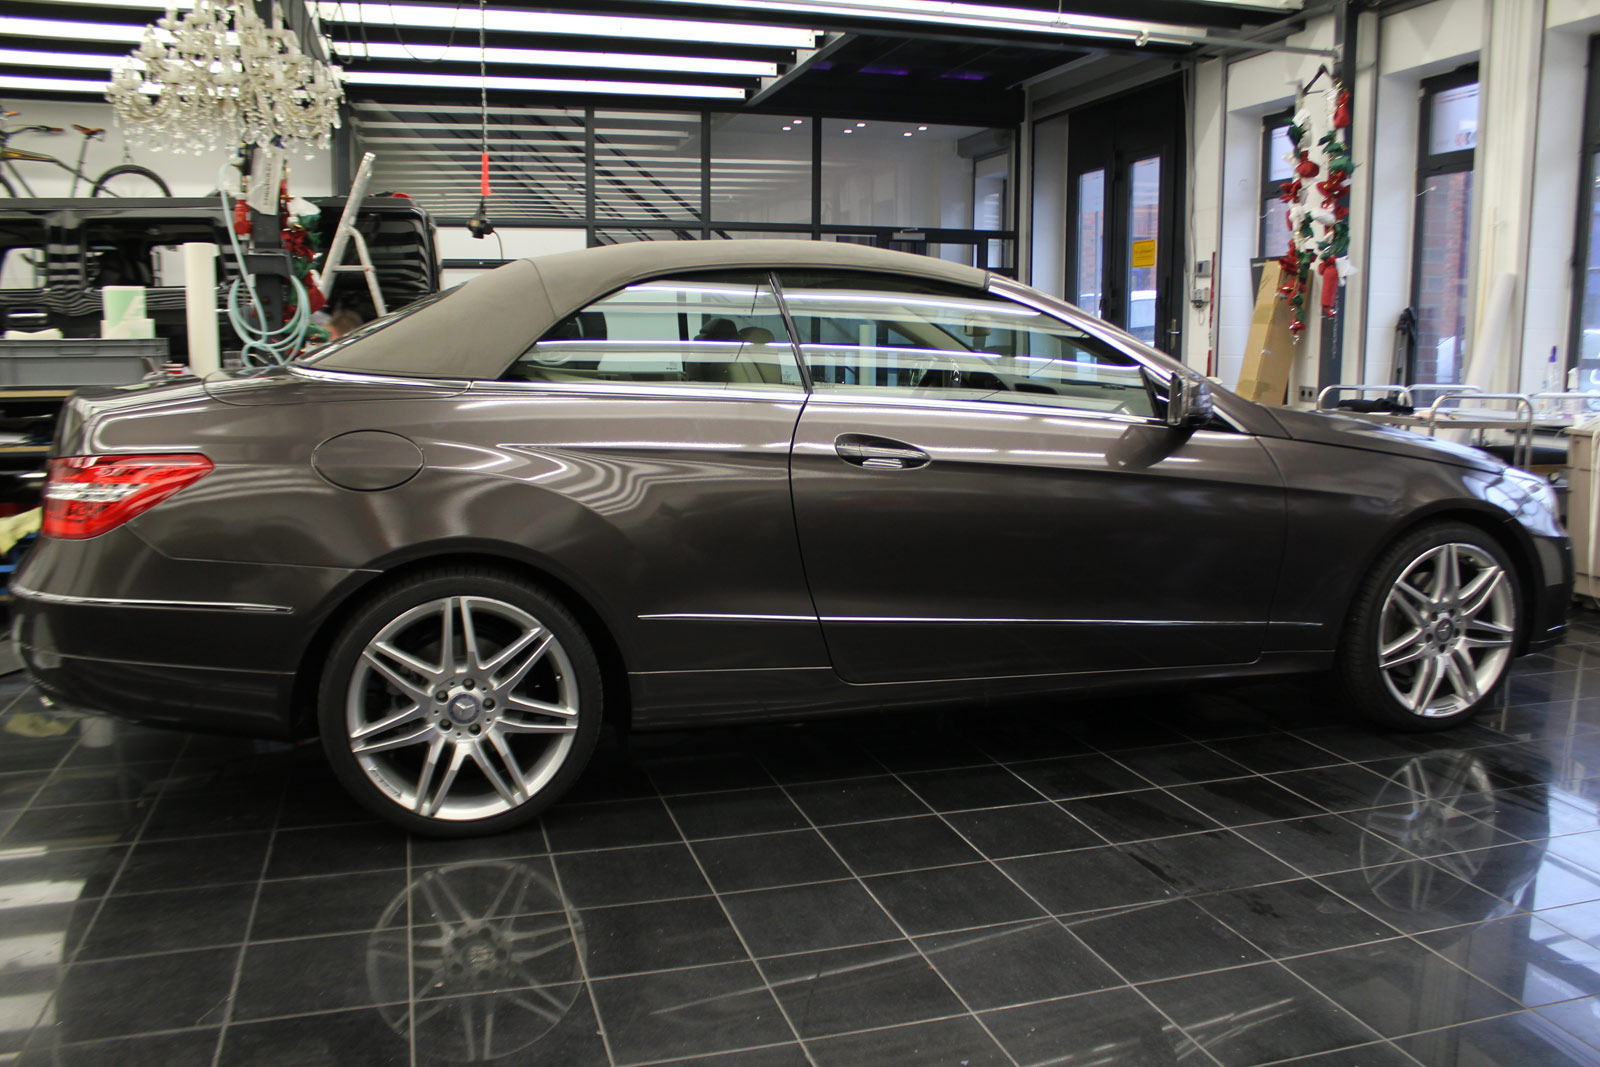 Mercedes_E-Klasse_Cabrio_Folierung_Stannitgrau_Metallic_Glanz_35